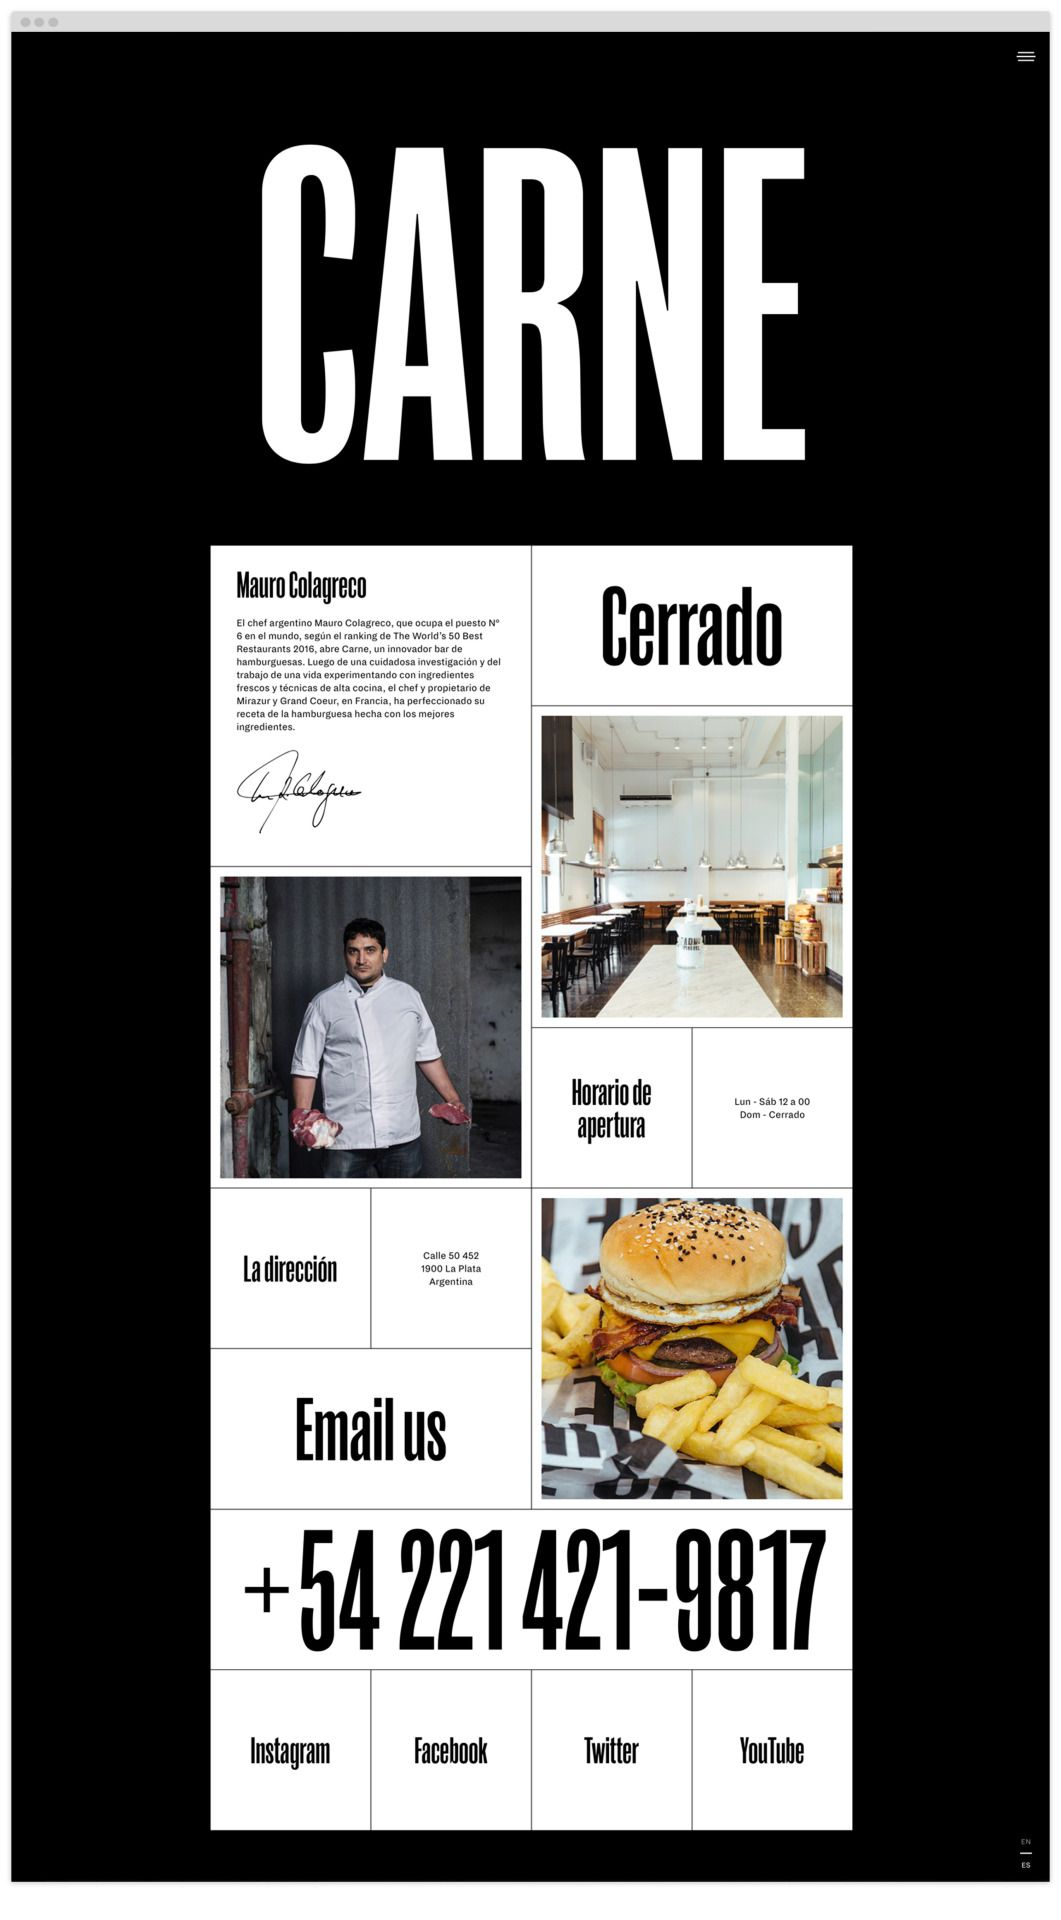 Wow Web 591 Carnehamburguesas Food Web Design Web Layout Inspiration Interactive Web Design